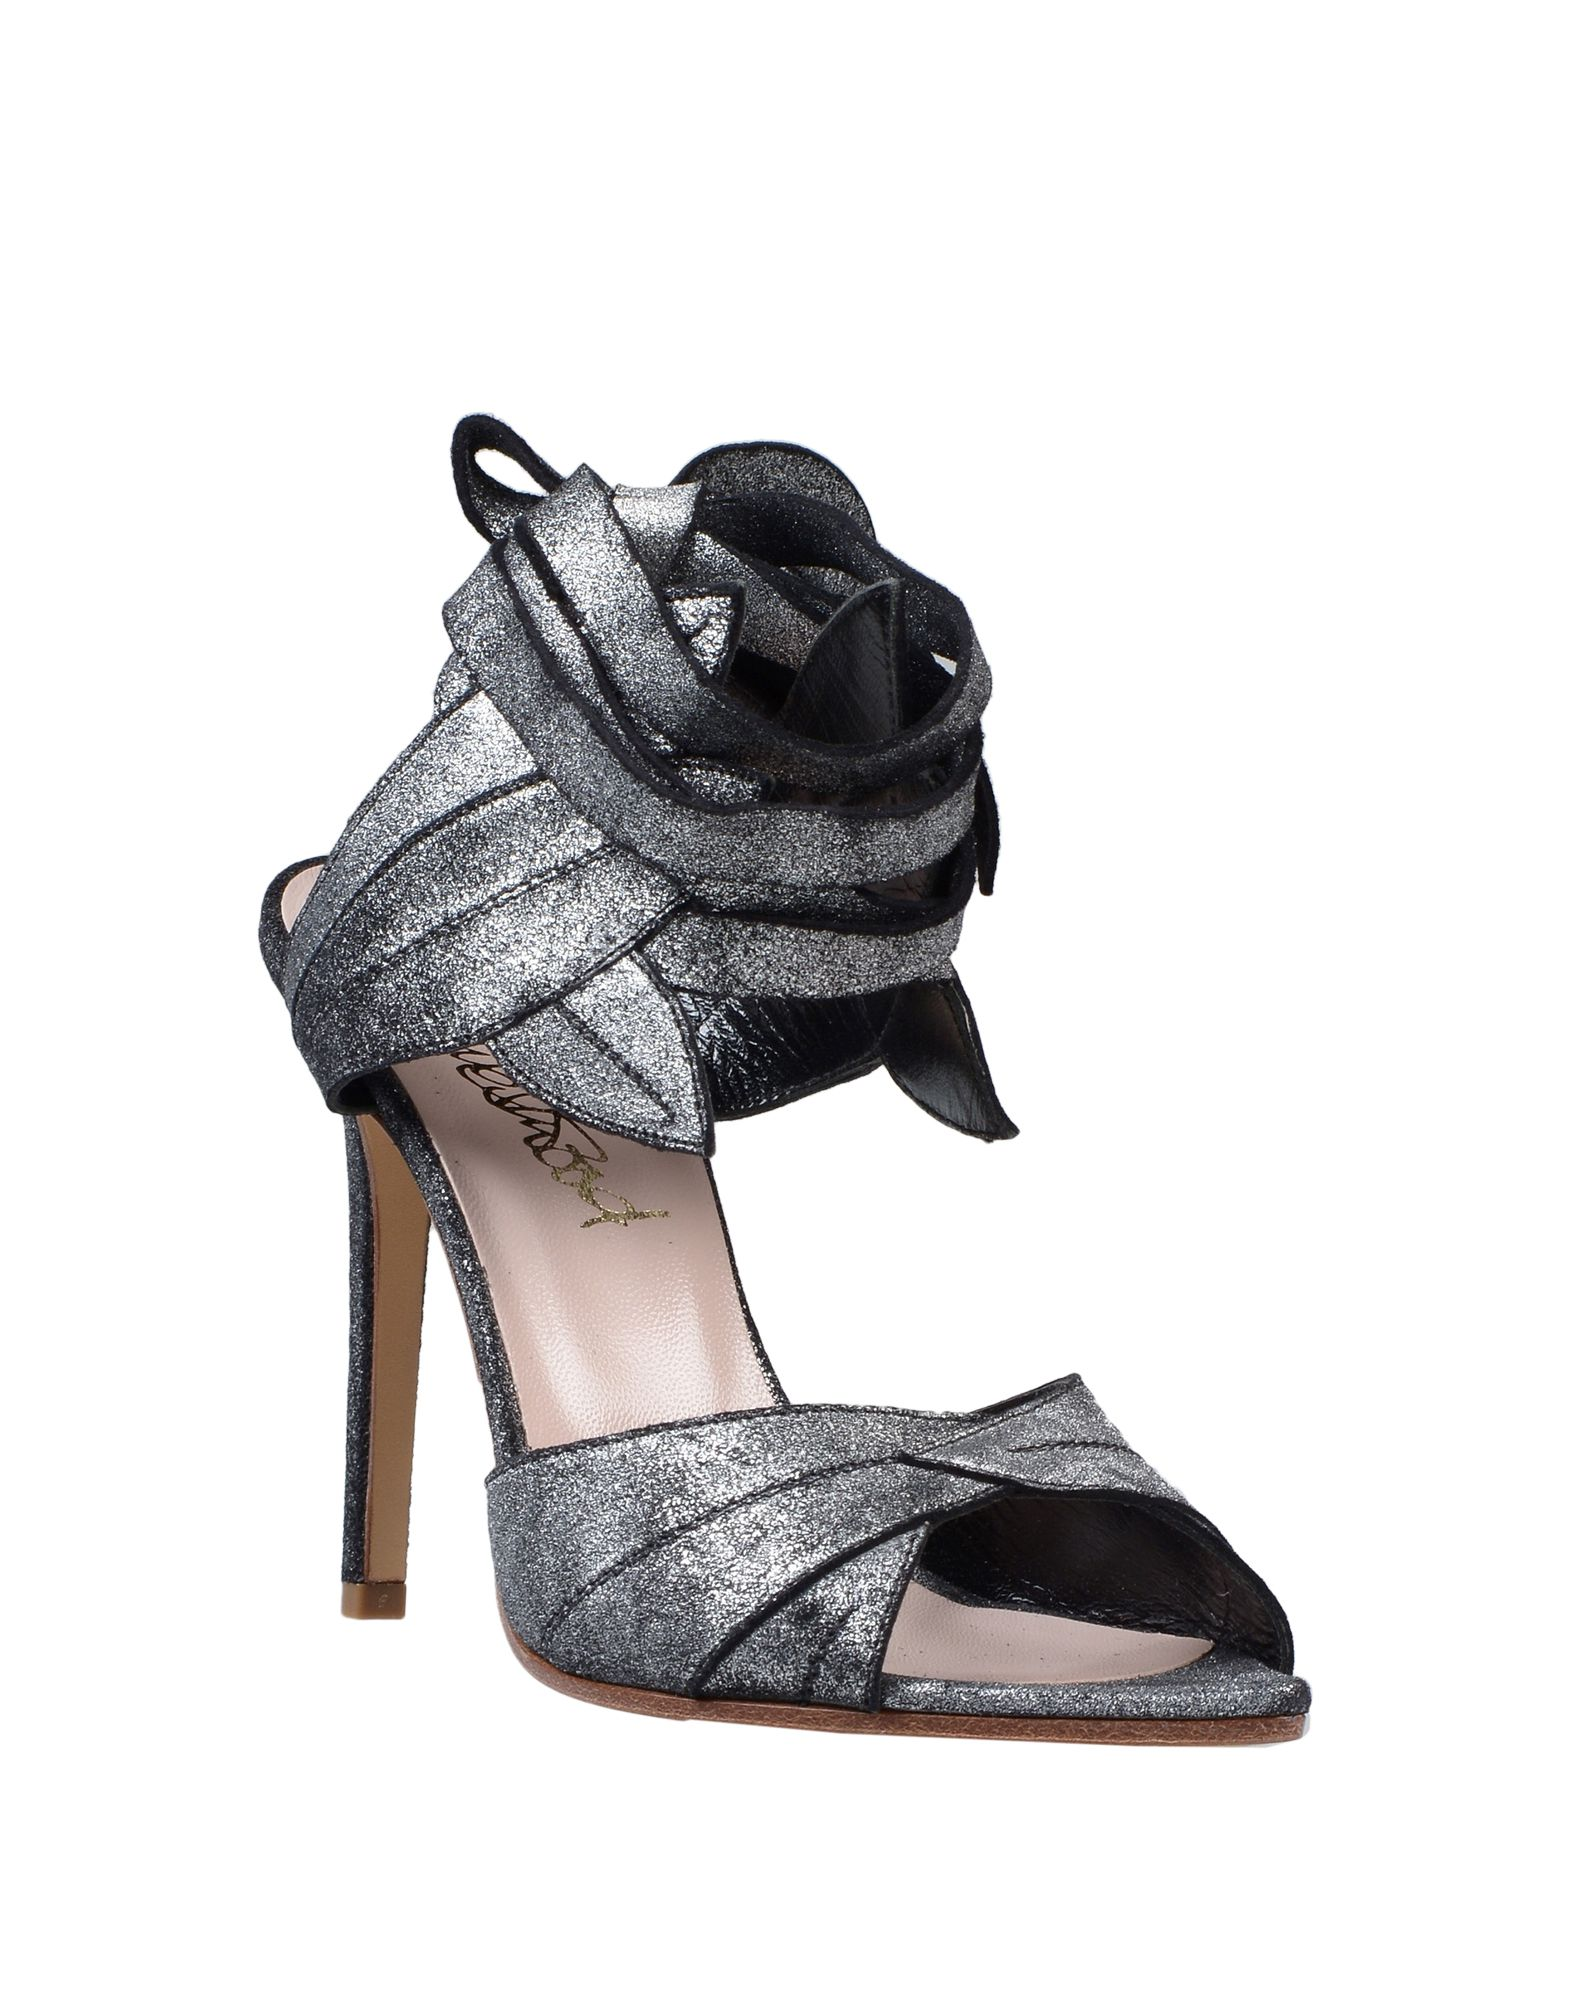 Vivienne Westwood Sandals - - - Women Vivienne Westwood Sandals online on  Canada - 11520992EF ce18f3